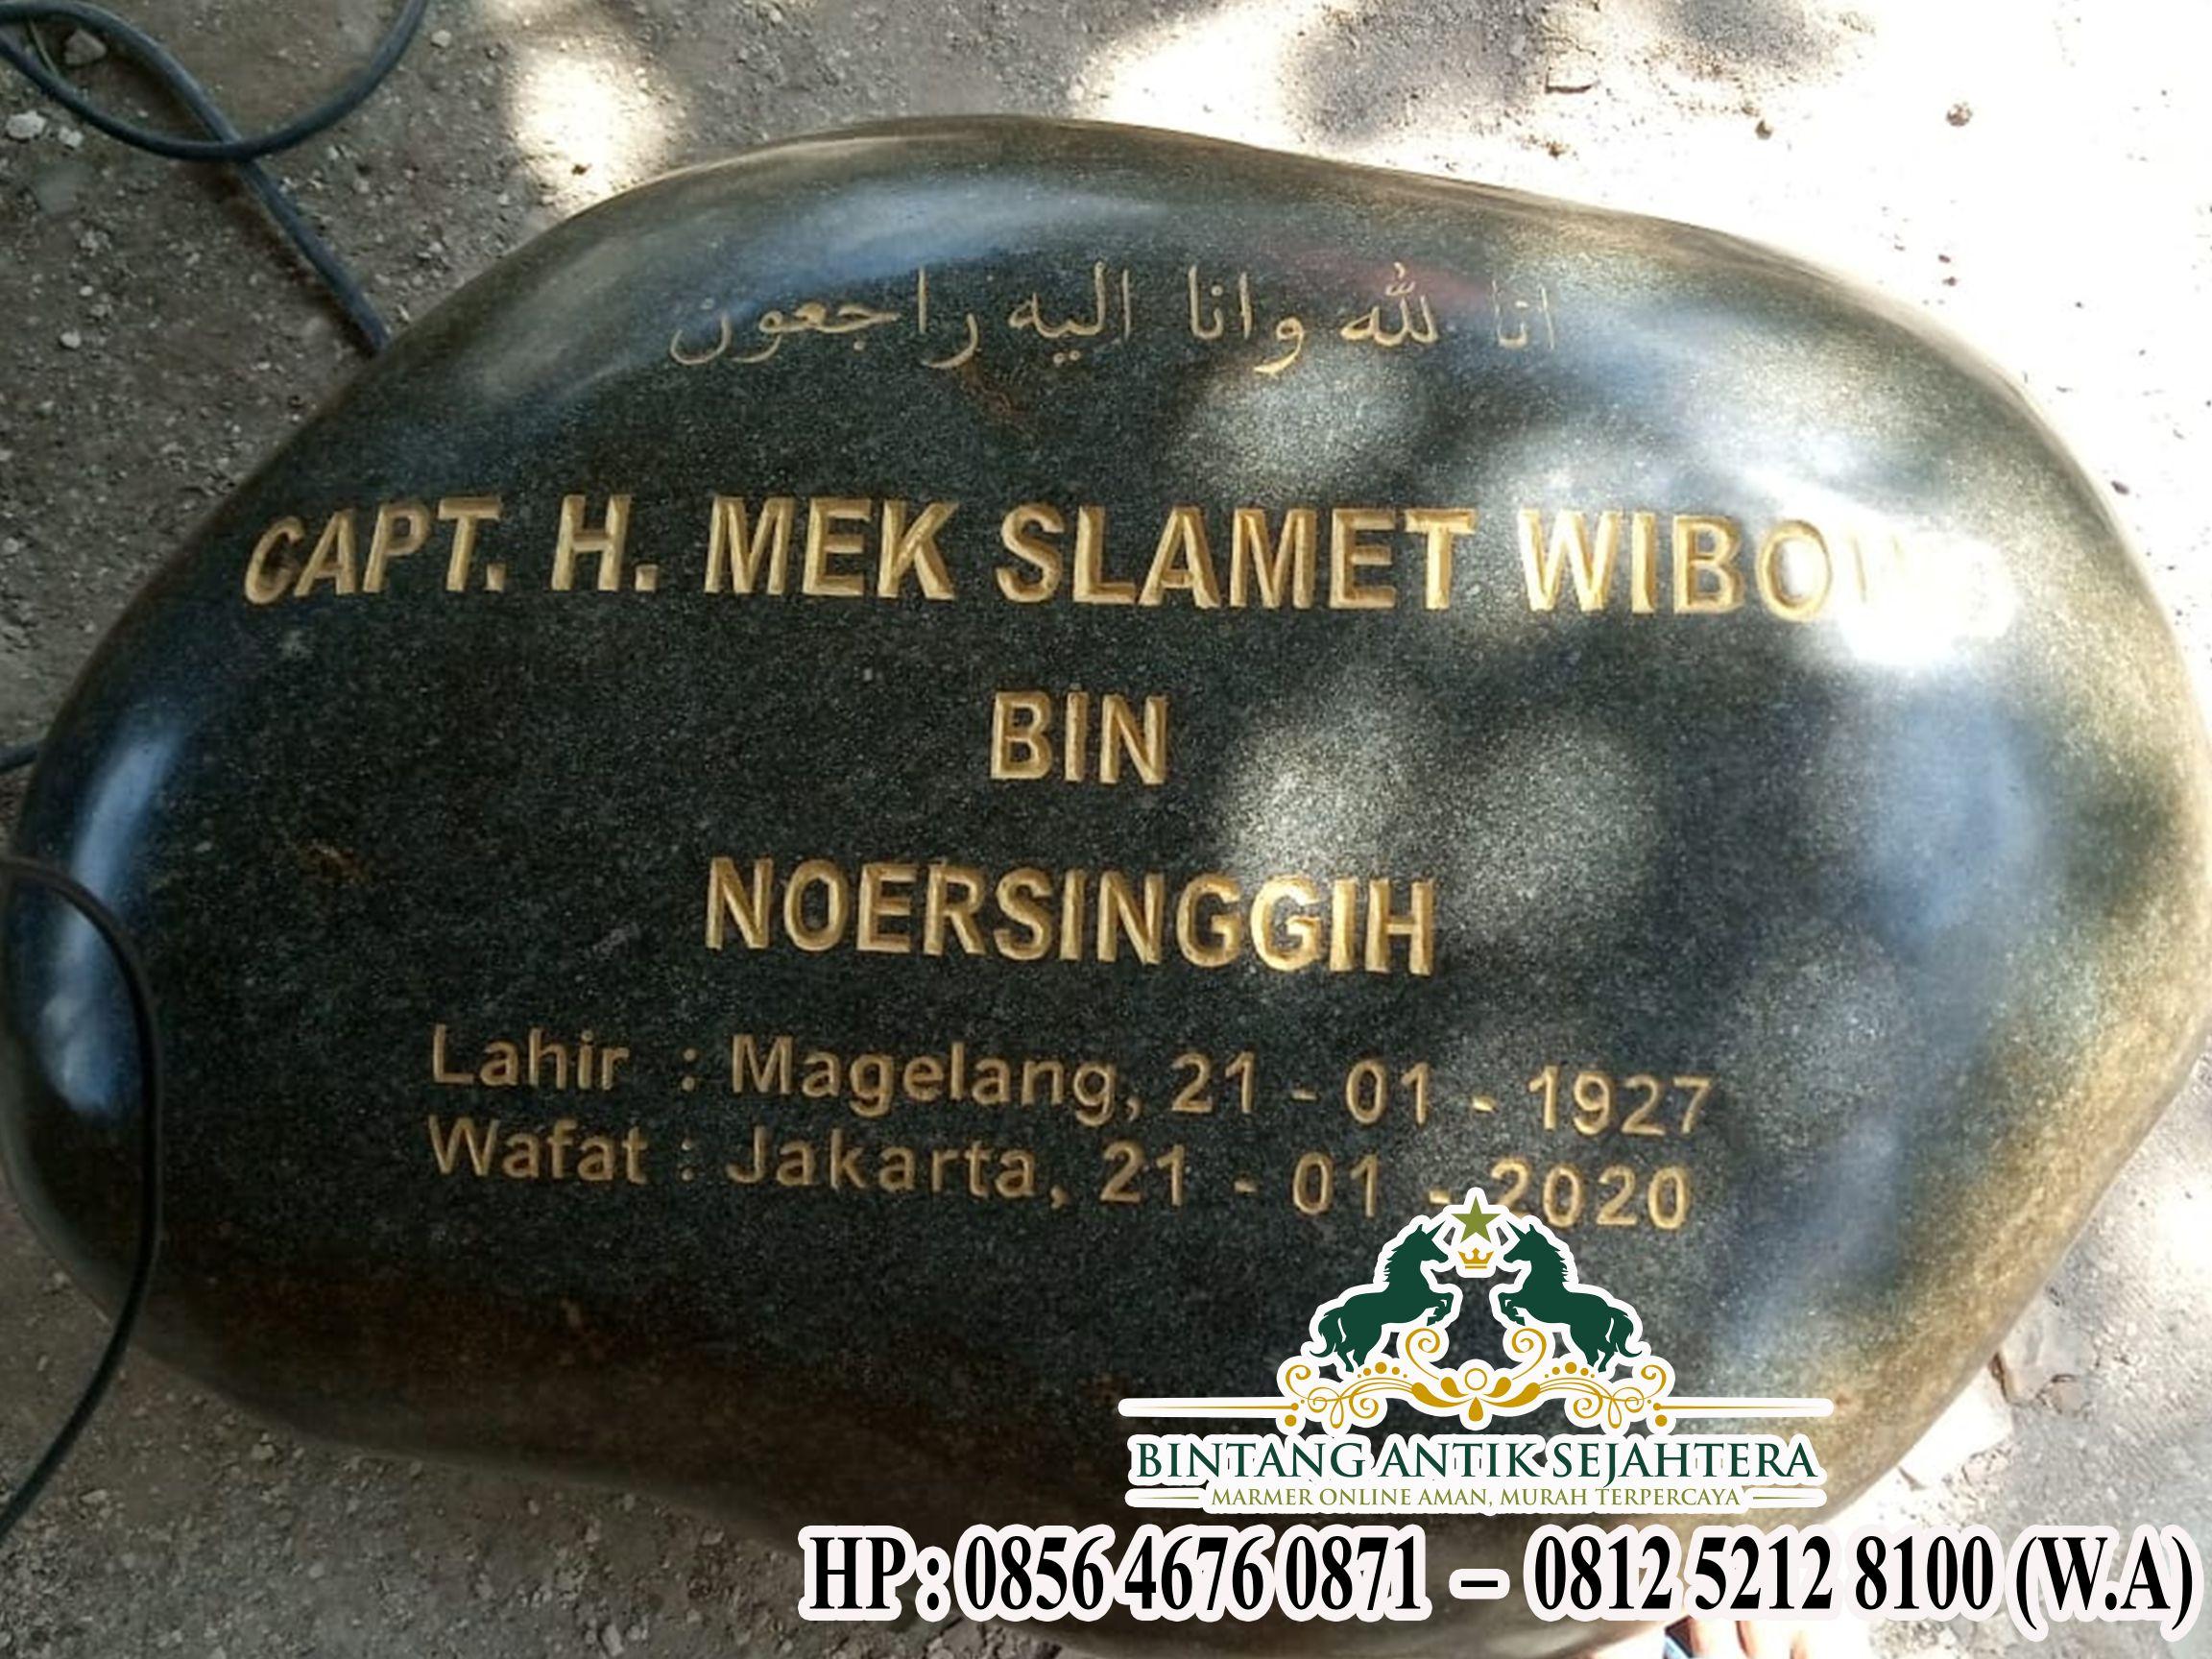 Nisan Batu Alam | Model Nisan Batu Kali Asli Tulungagung